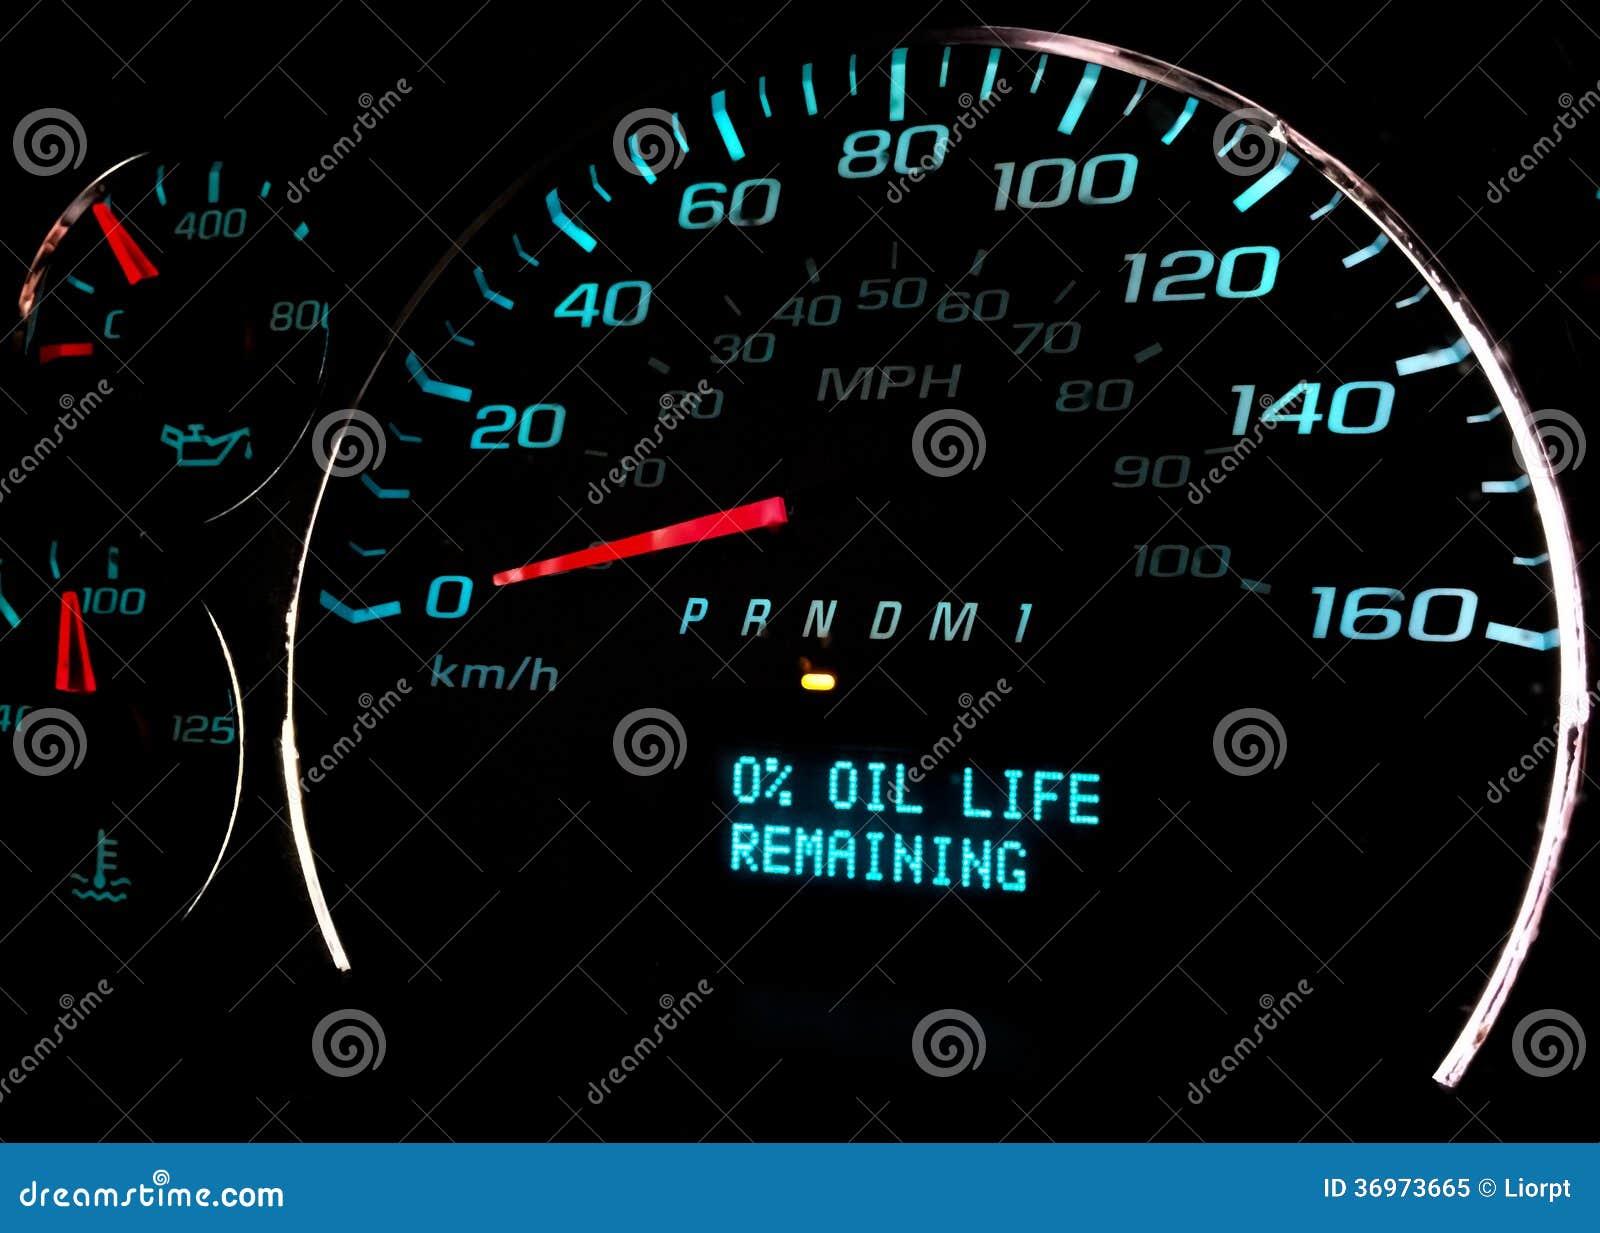 Change oil soon warning light stock image image of service filter change oil soon warning light service filter buycottarizona Image collections